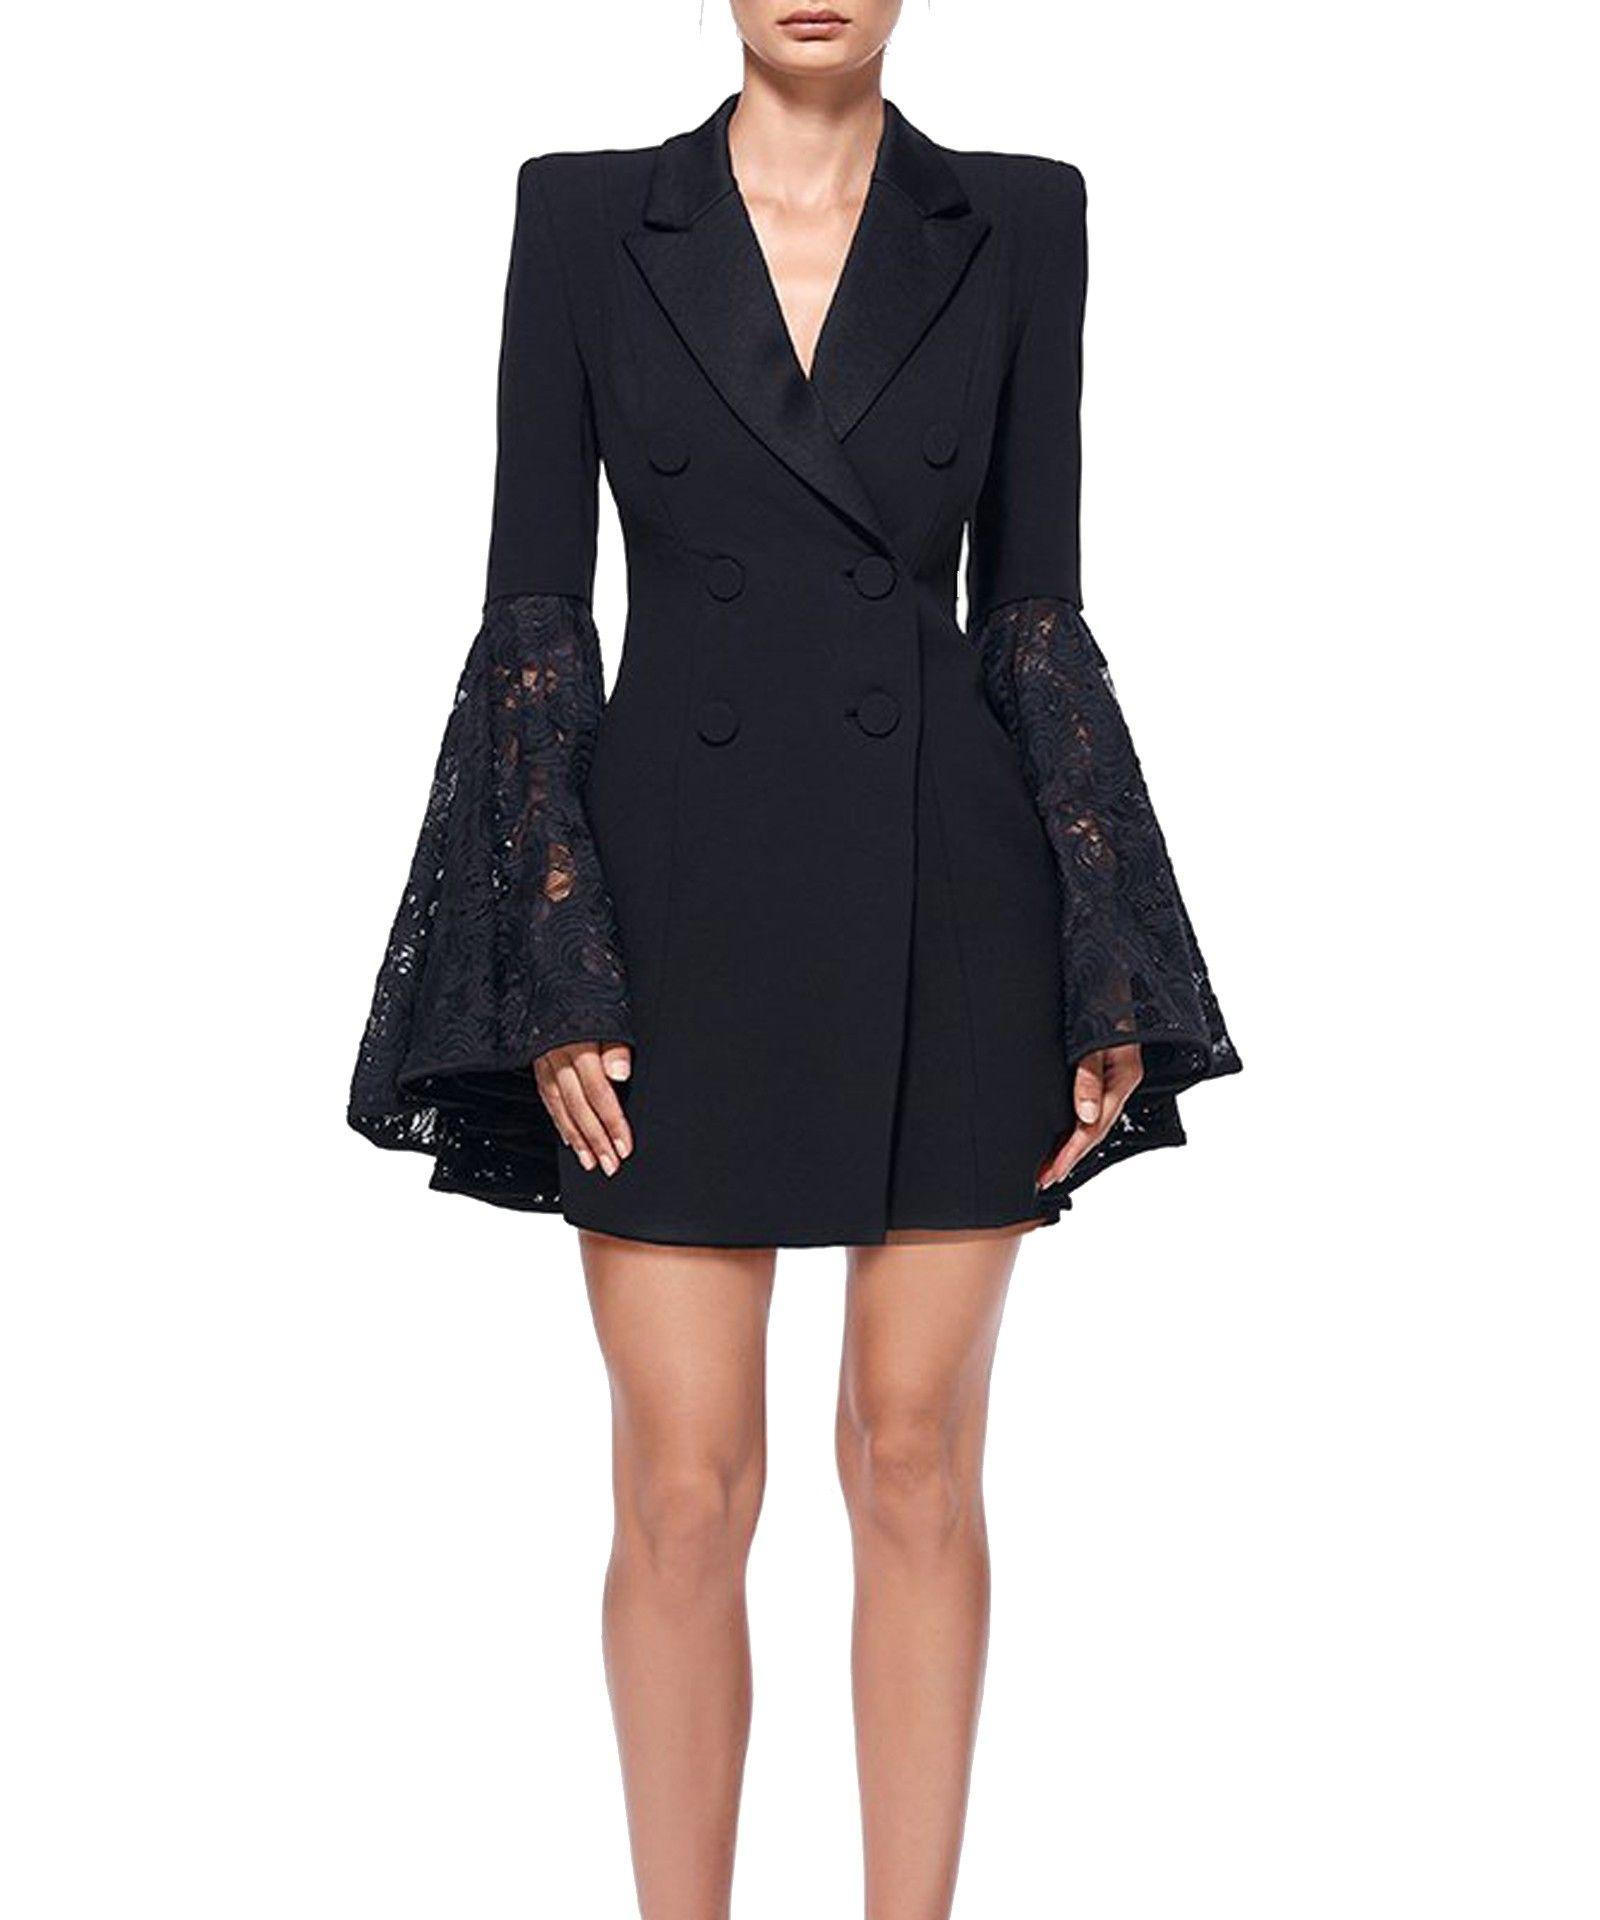 Misha Collection Sabrina Blazer Dress The Box Boutique, Online Concept